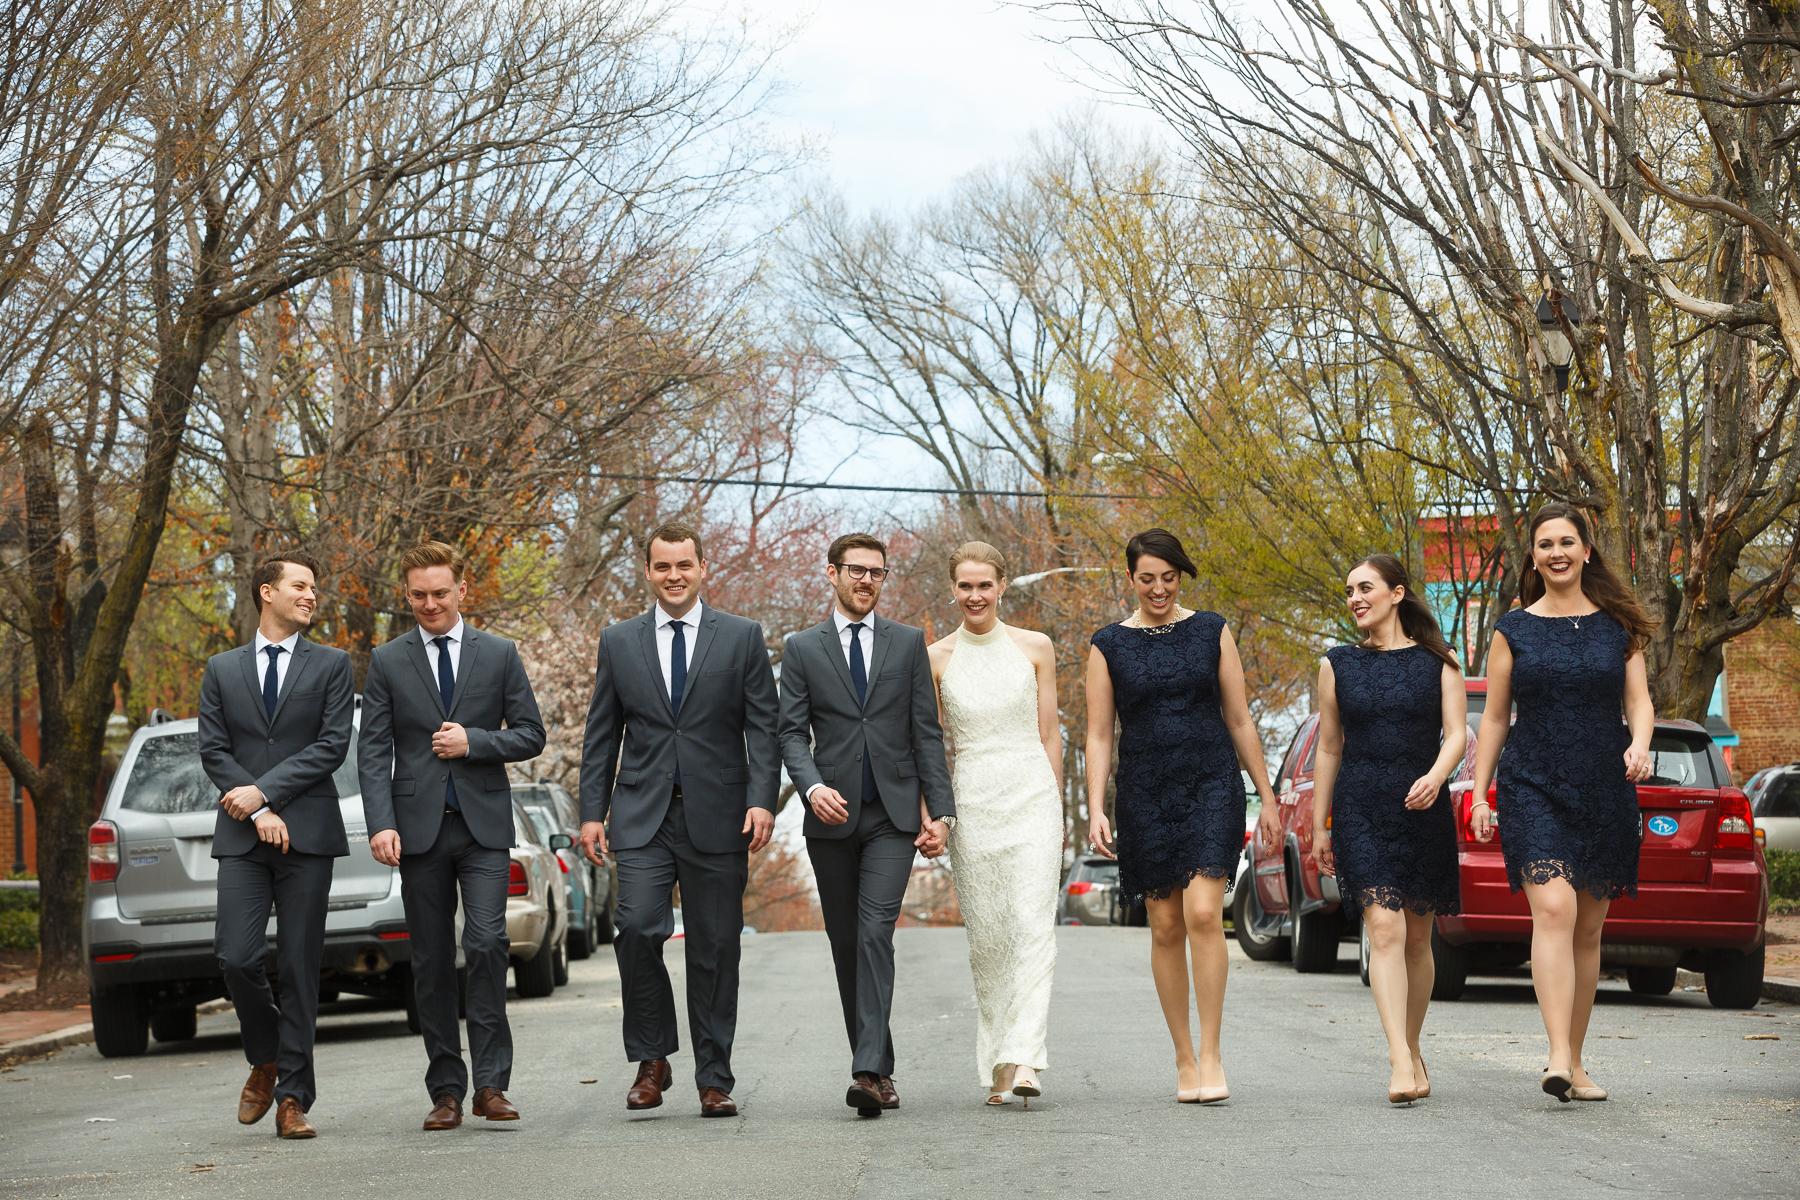 Jimmy Amanda Kelly Wedding_  Jonathan Heisler  _ _3182017 _ 294.jpg